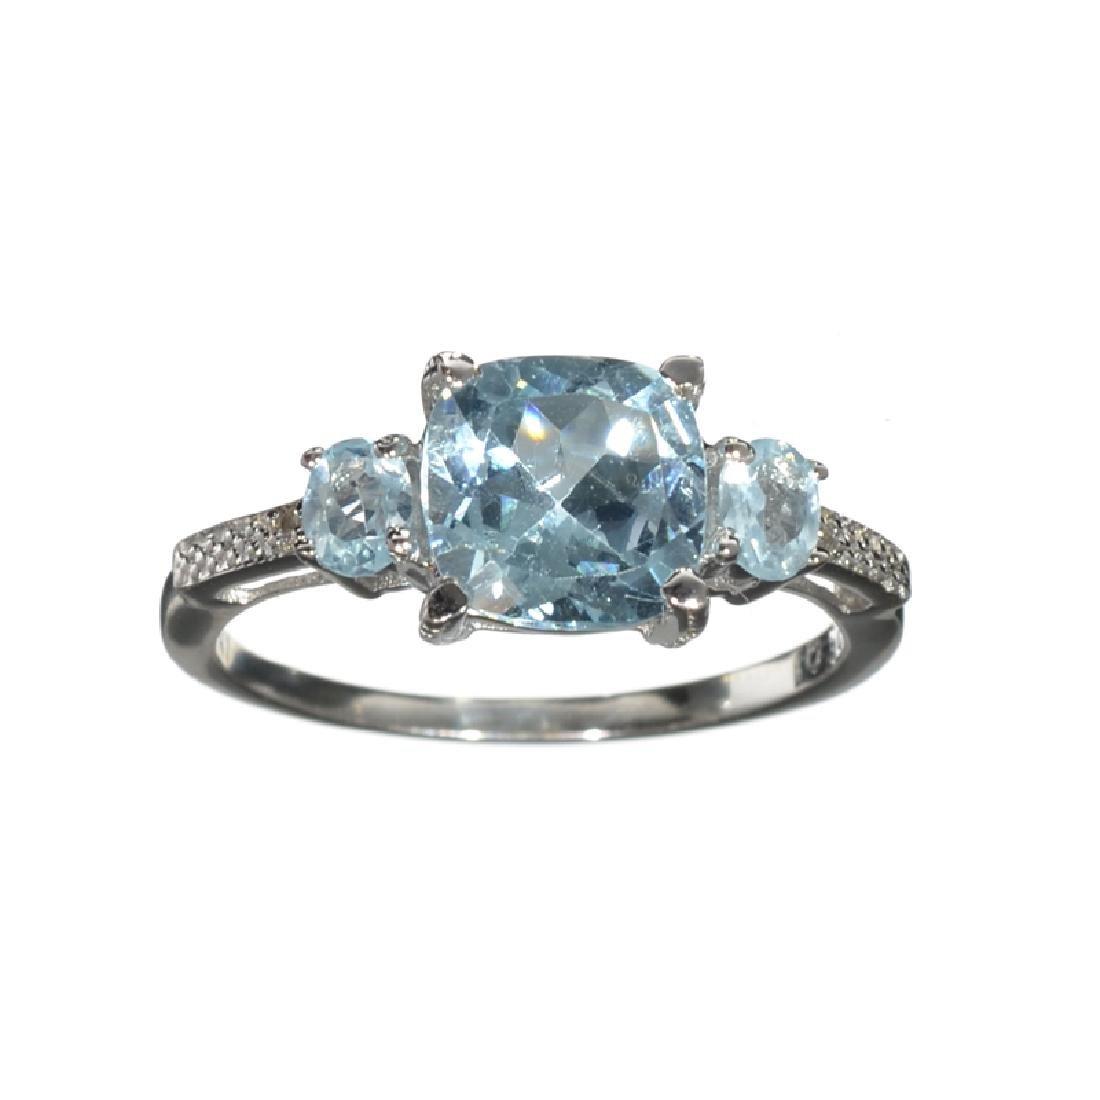 APP: 0.3k Fine Jewelry 2.91CT Blue Topaz And White